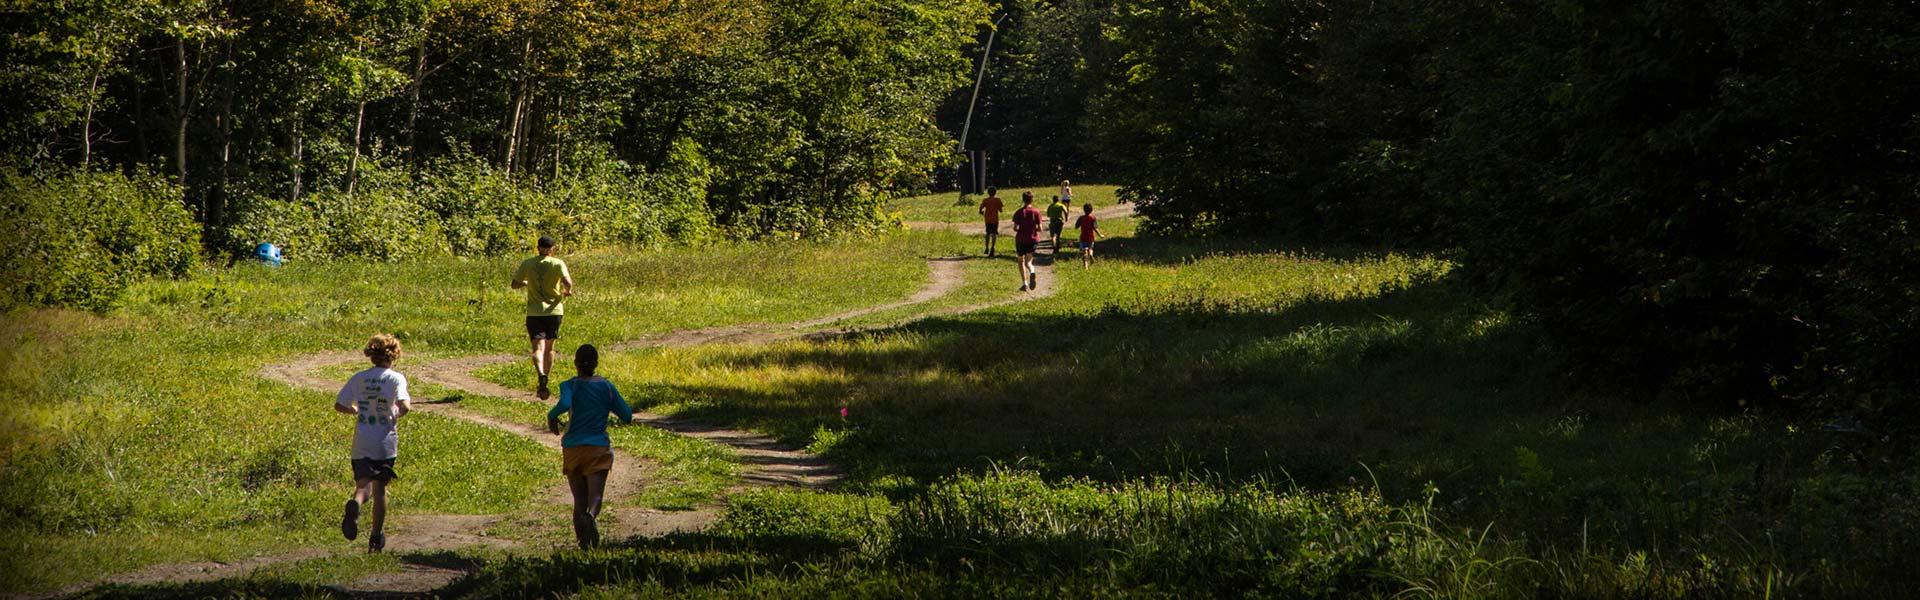 jay peak trail run header